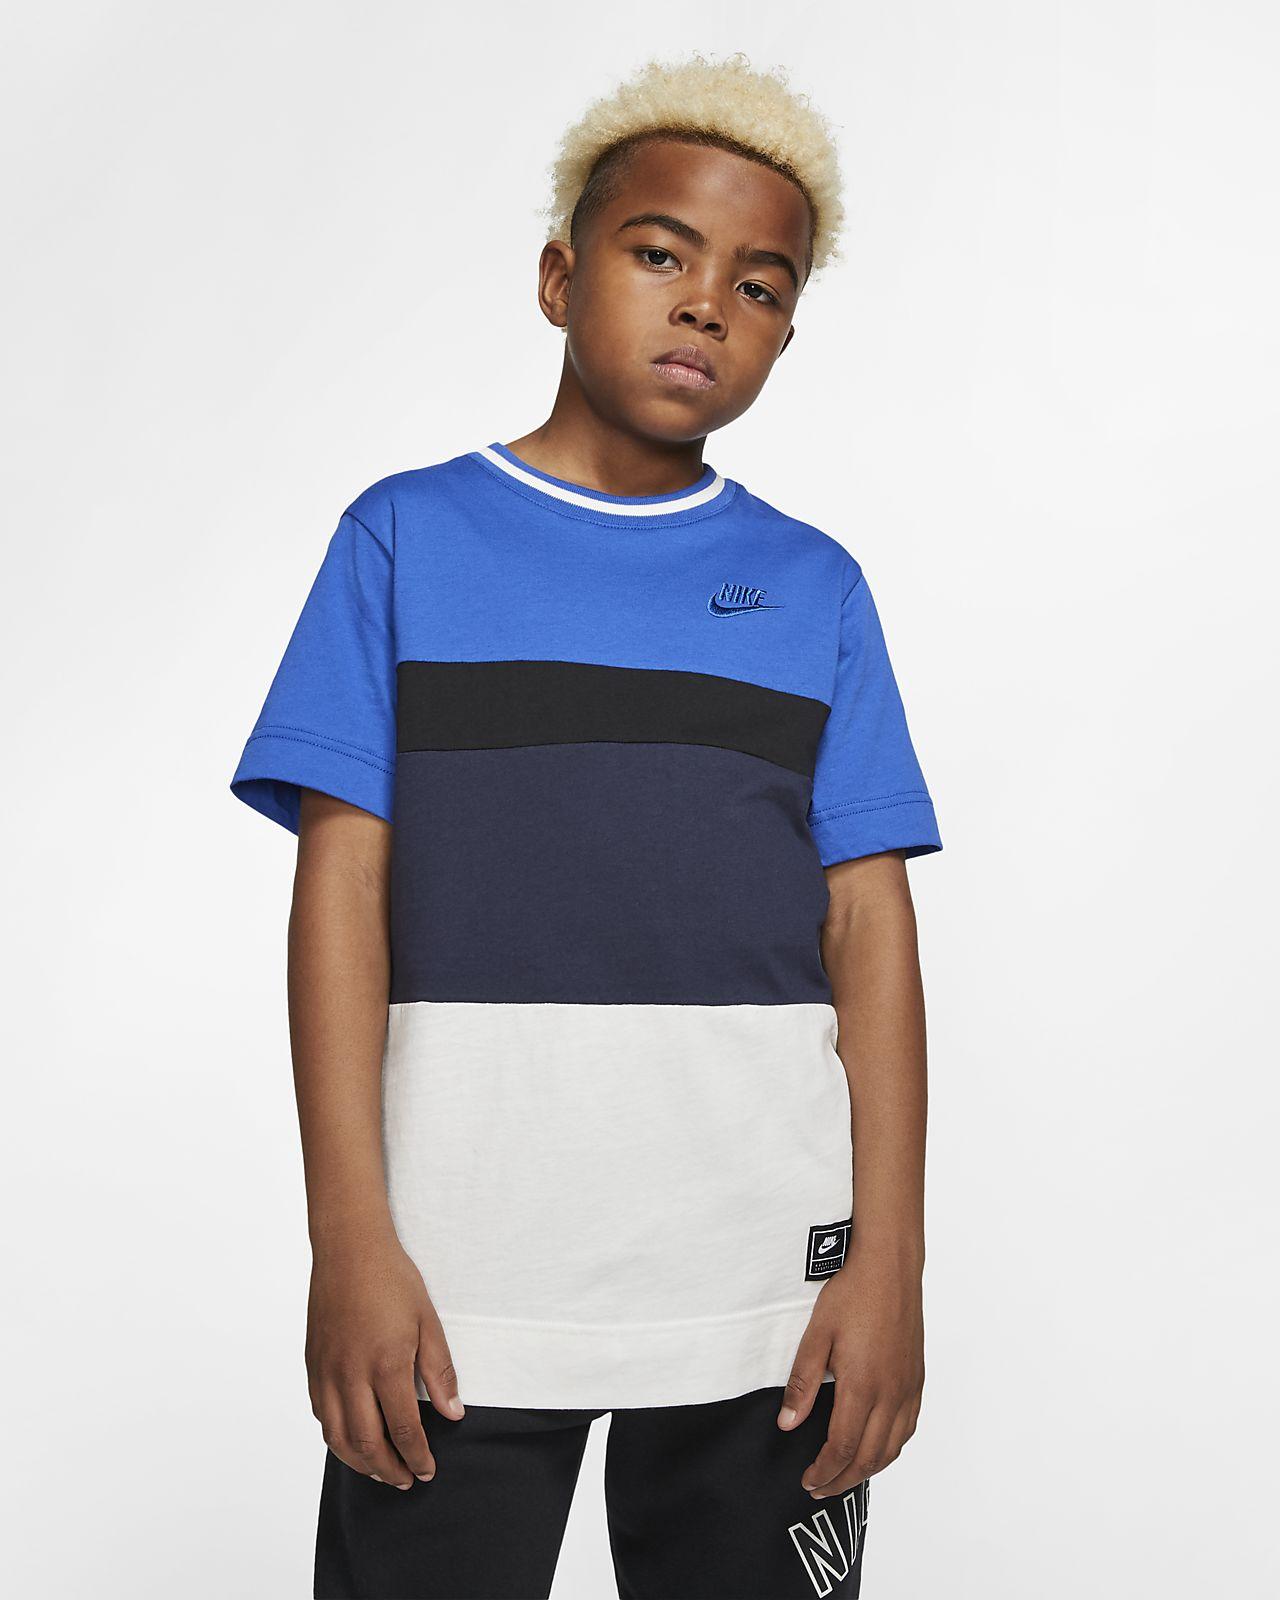 Prenda superior de manga corta para niño talla grande Nike Air